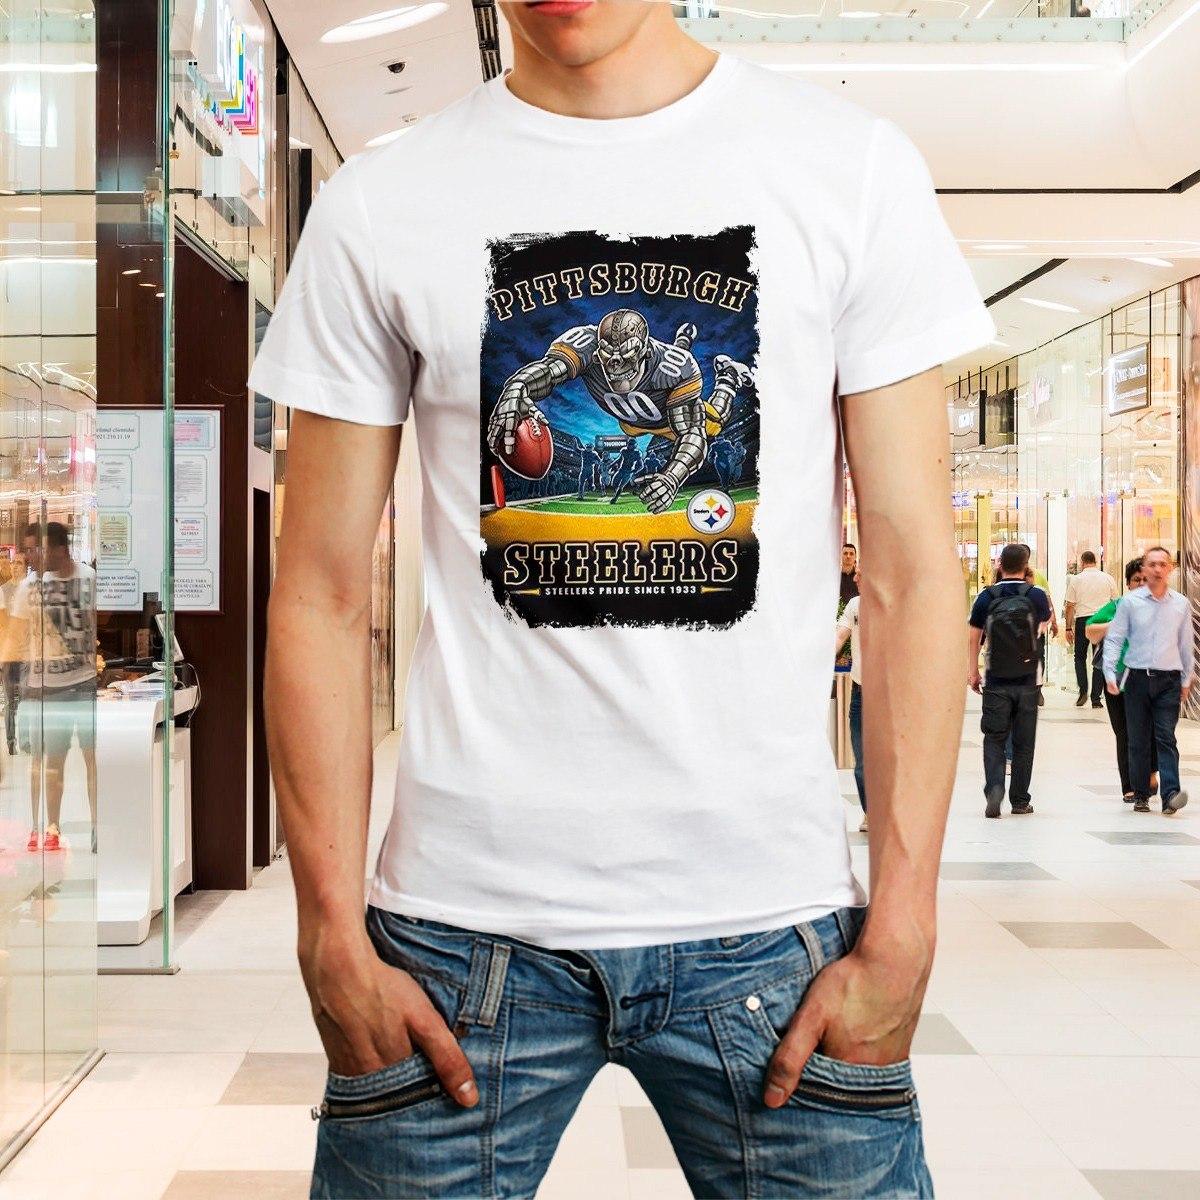 56d7a2aaa6 camiseta steelers camisa futebol americano nfl roupa homem. Carregando zoom.